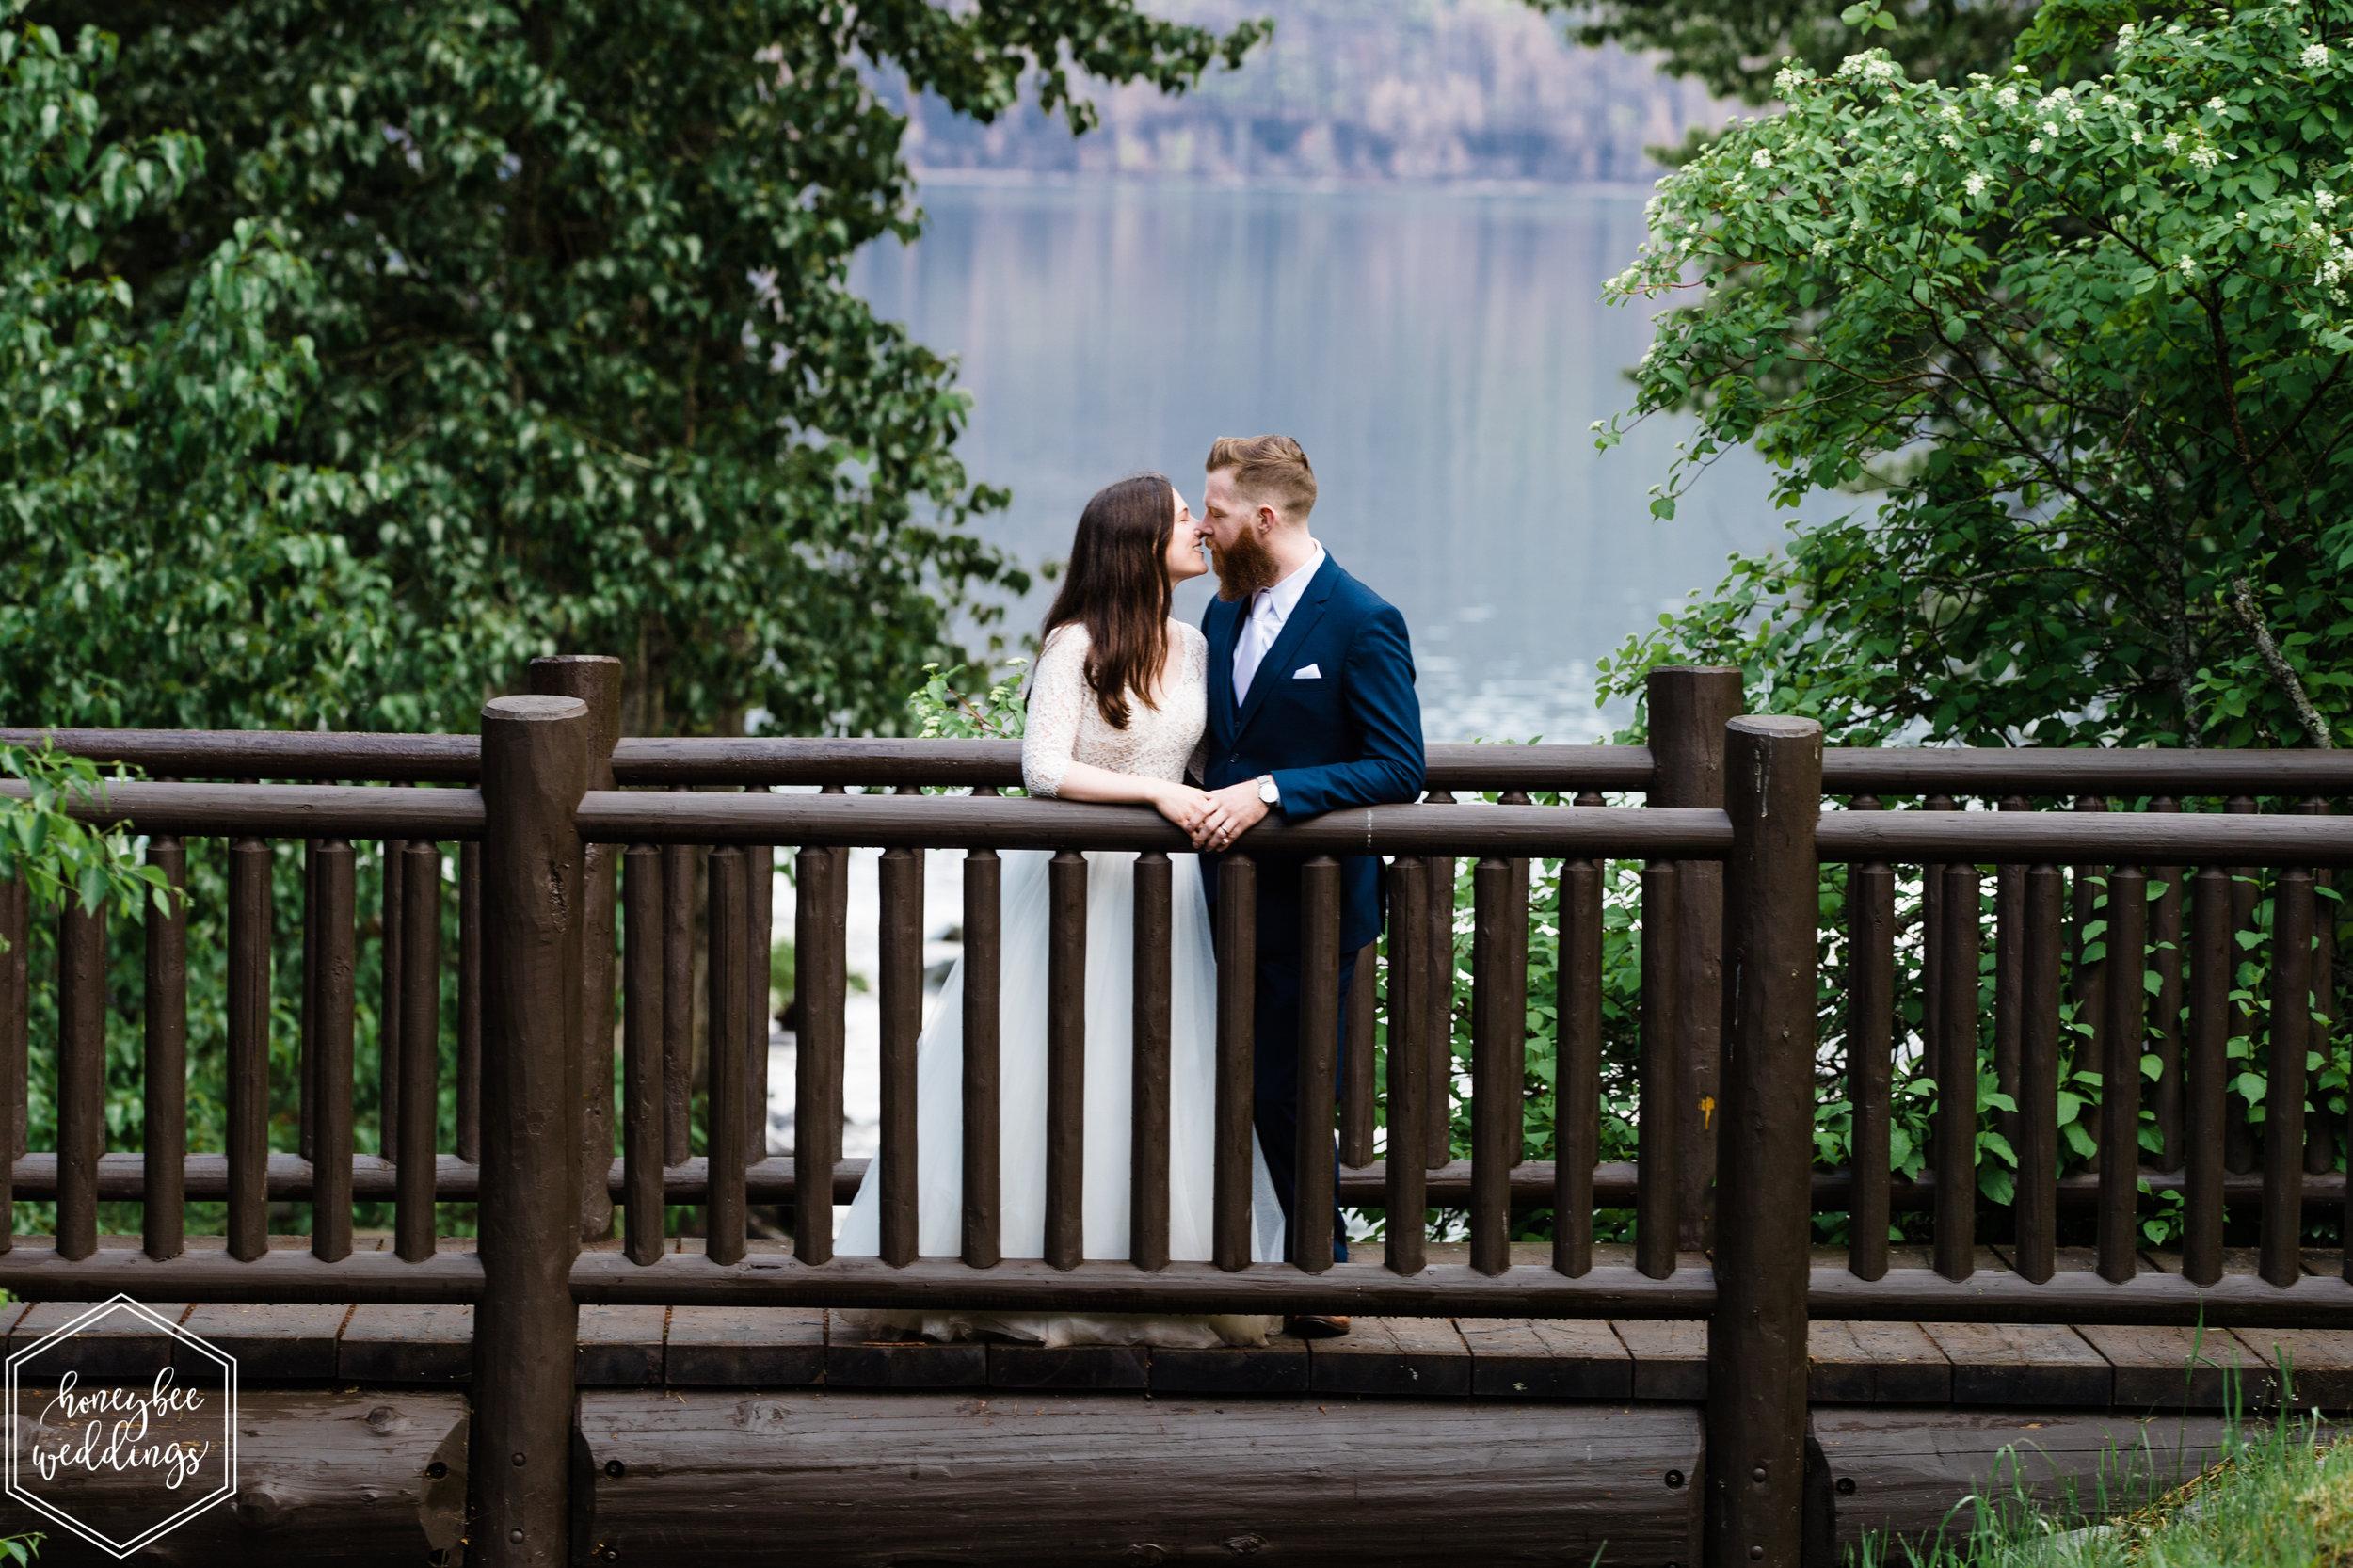 264Glacier National Park Wedding_Izaak Walton Inn Wedding_Honeybee Weddings_Norah & Kyle_June 09, 2019-66.jpg